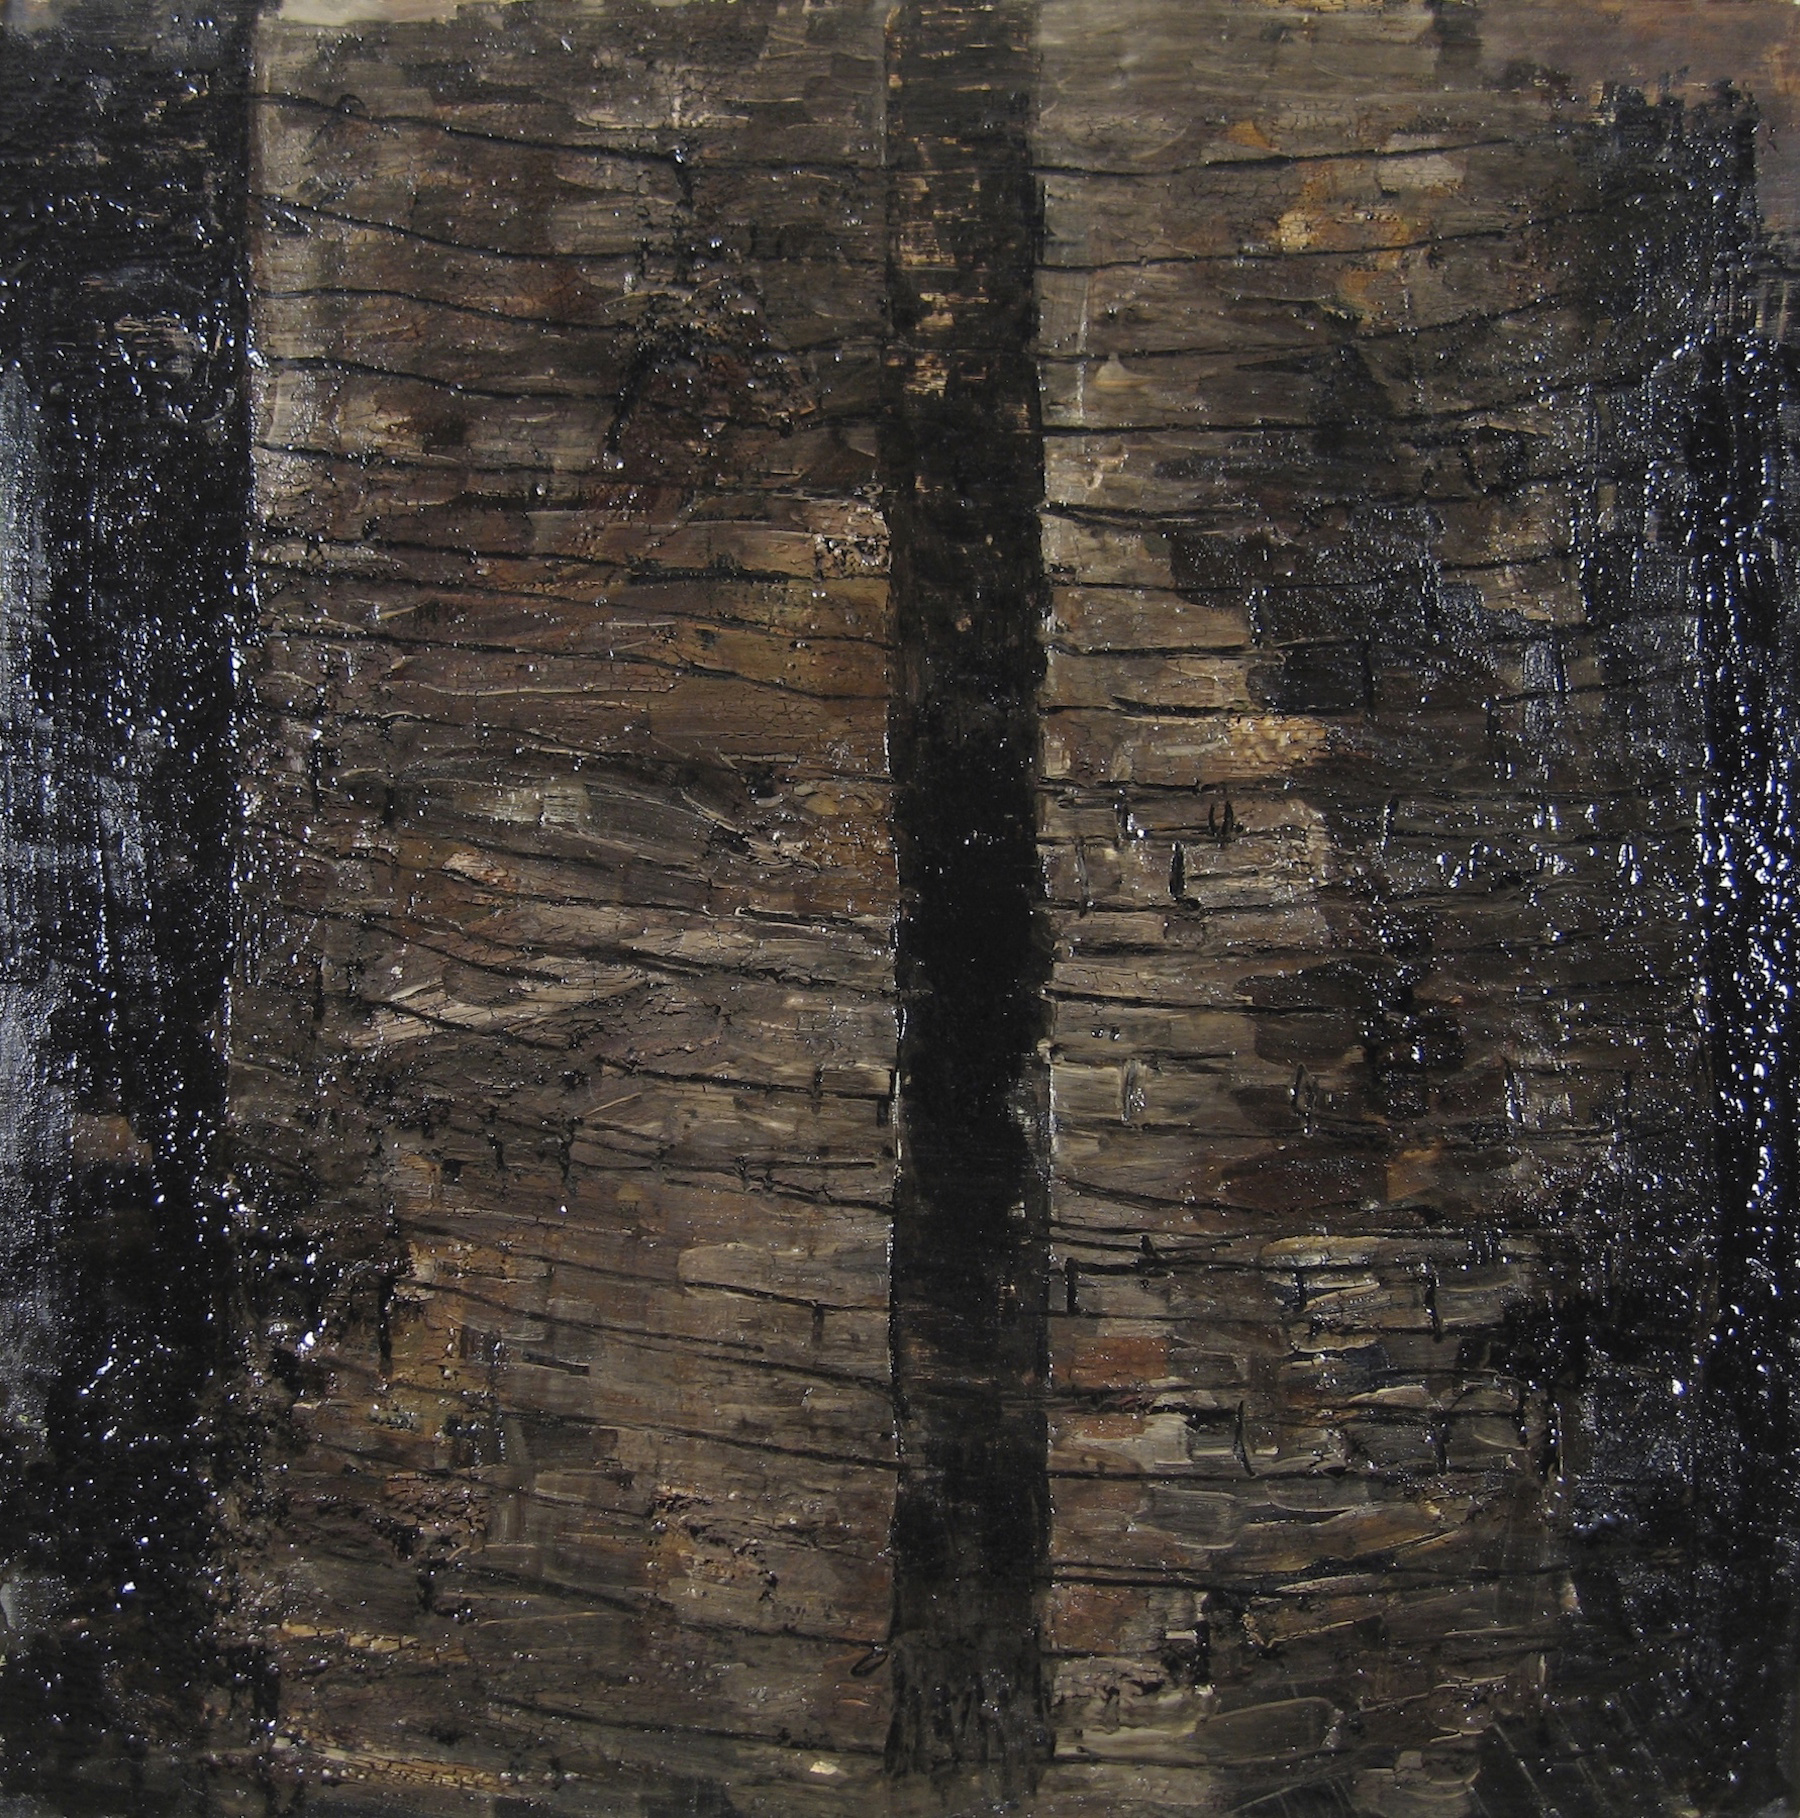 Leslie Zelamsky, An Old Friend, mixed media, 30x30, $1,900